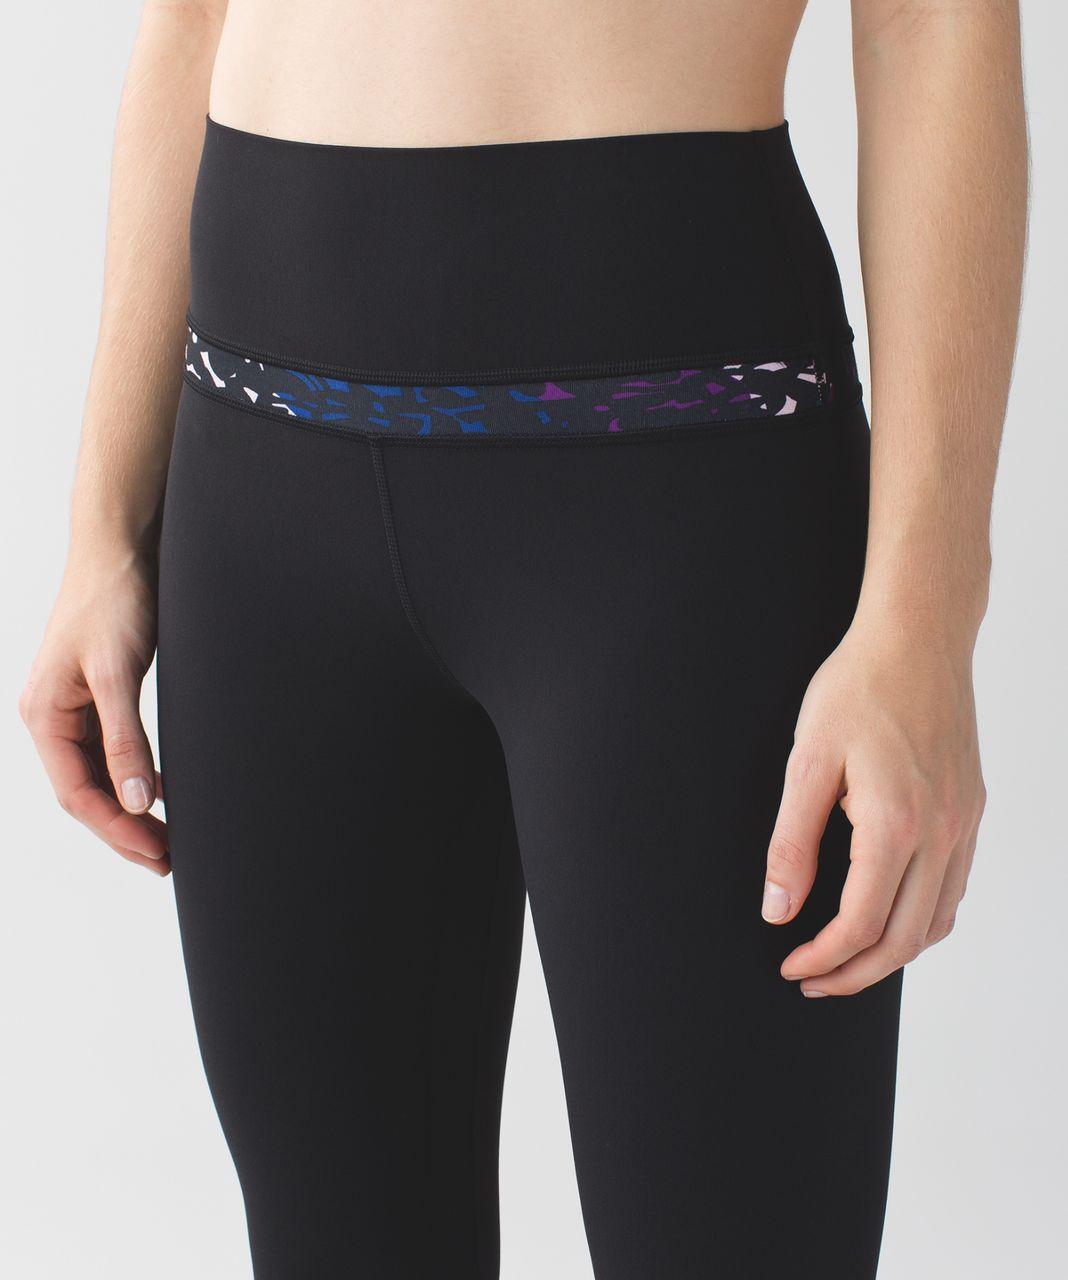 Lululemon Align Pant - Naval Blue / Shadow Wrap Multi